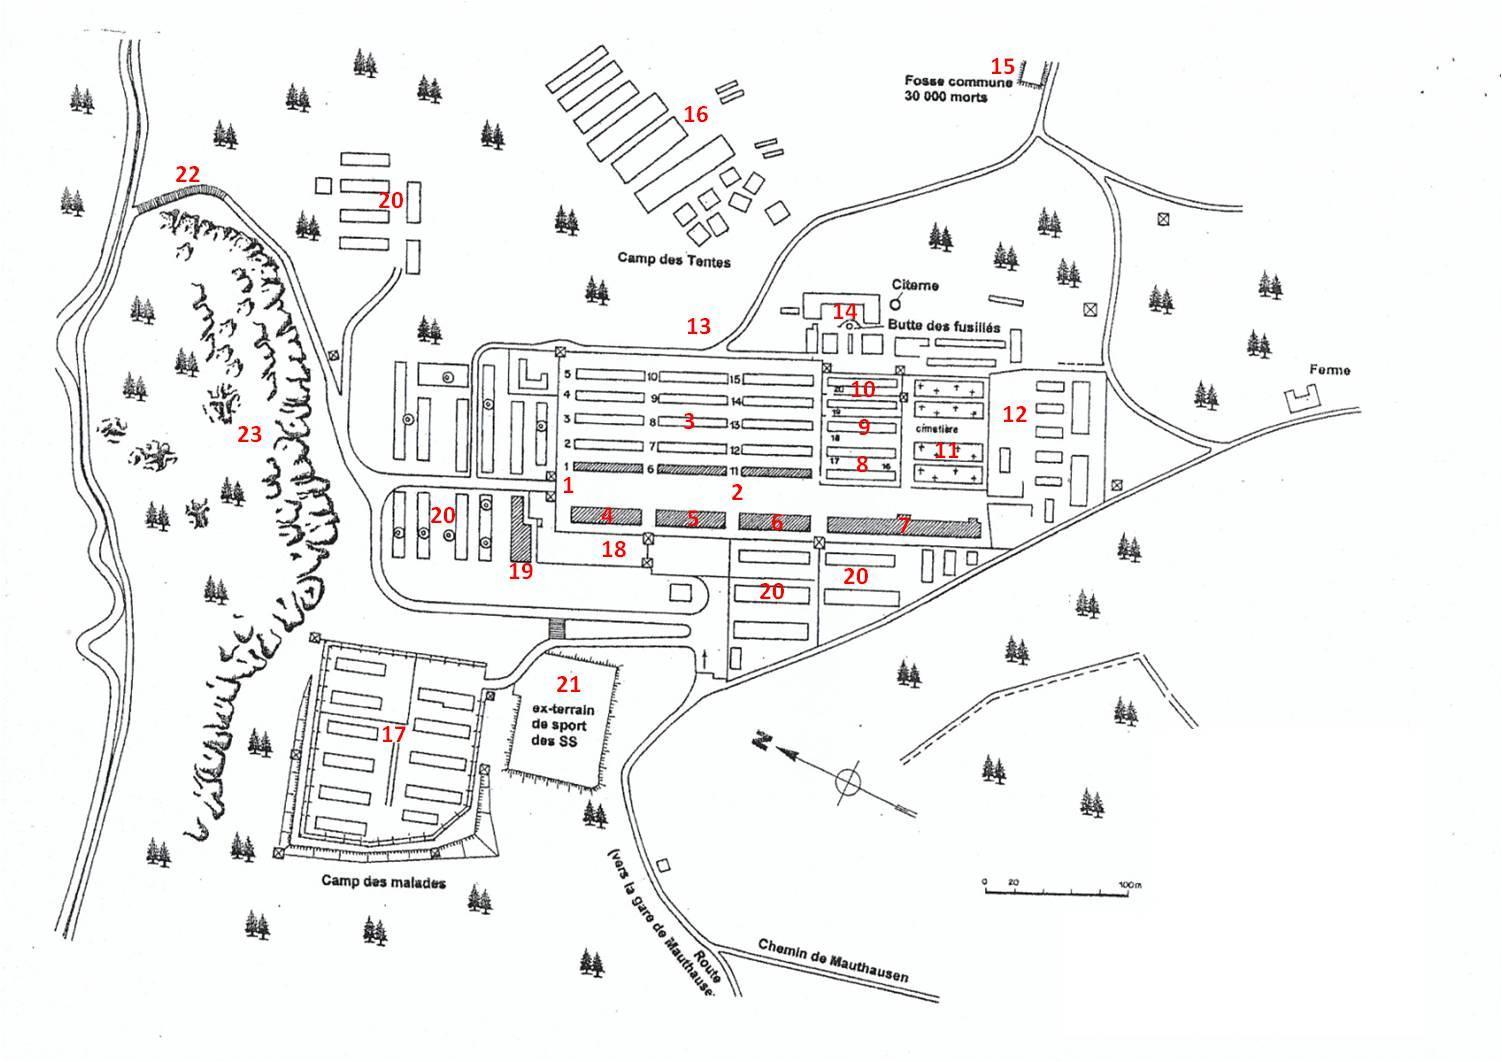 C:\Users\pierre\Desktop\AM 2019-2020\3 AM (refonte site)\drive\0 202101\plan camp central.jpg